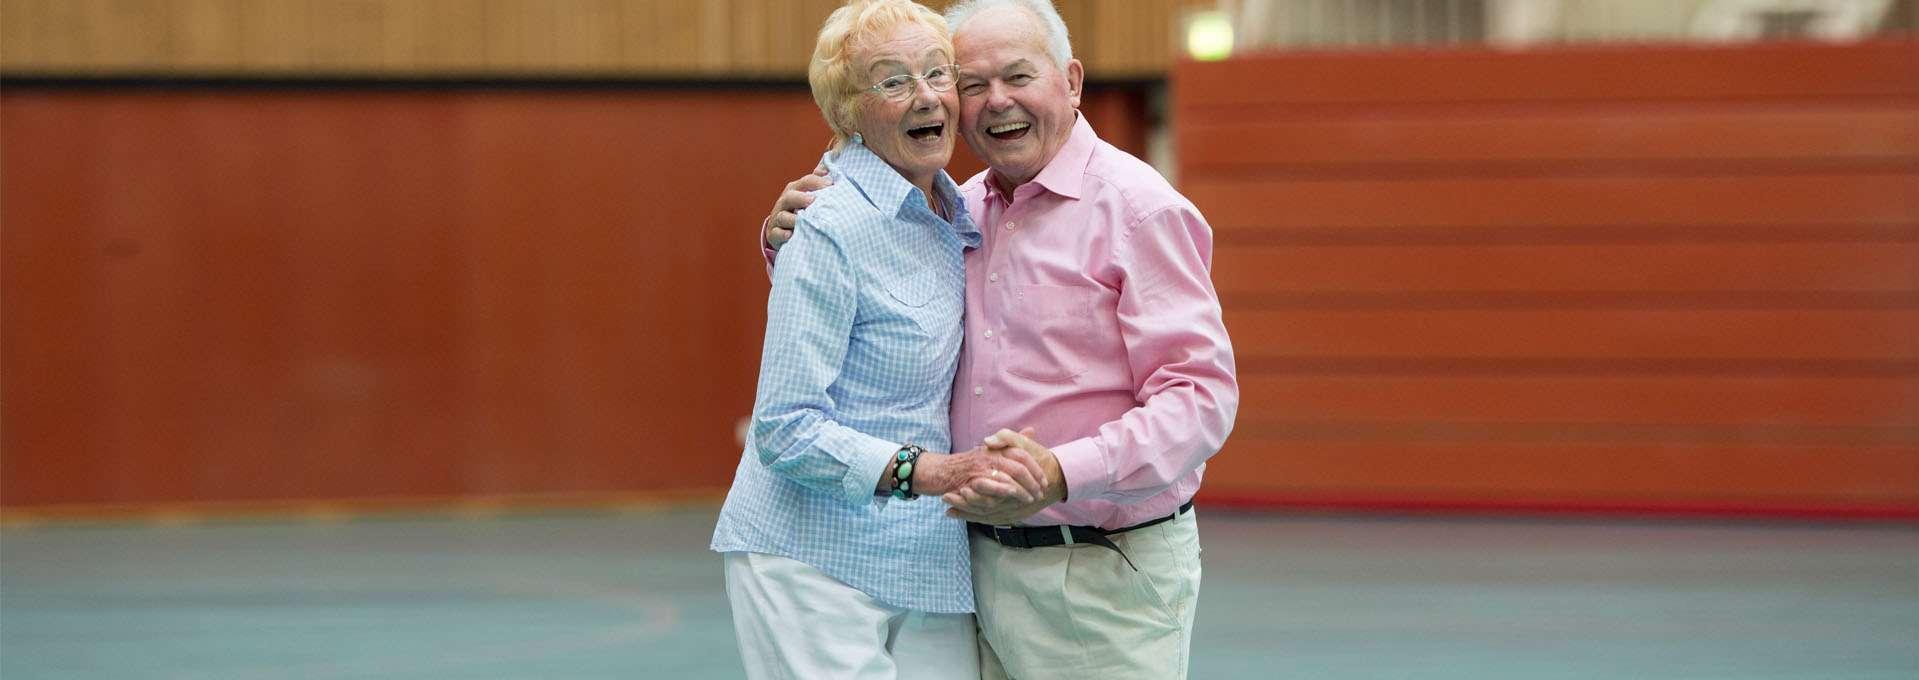 Teaser Freie Wohlfahrtspflege: Älteres Ehepaar tanzt